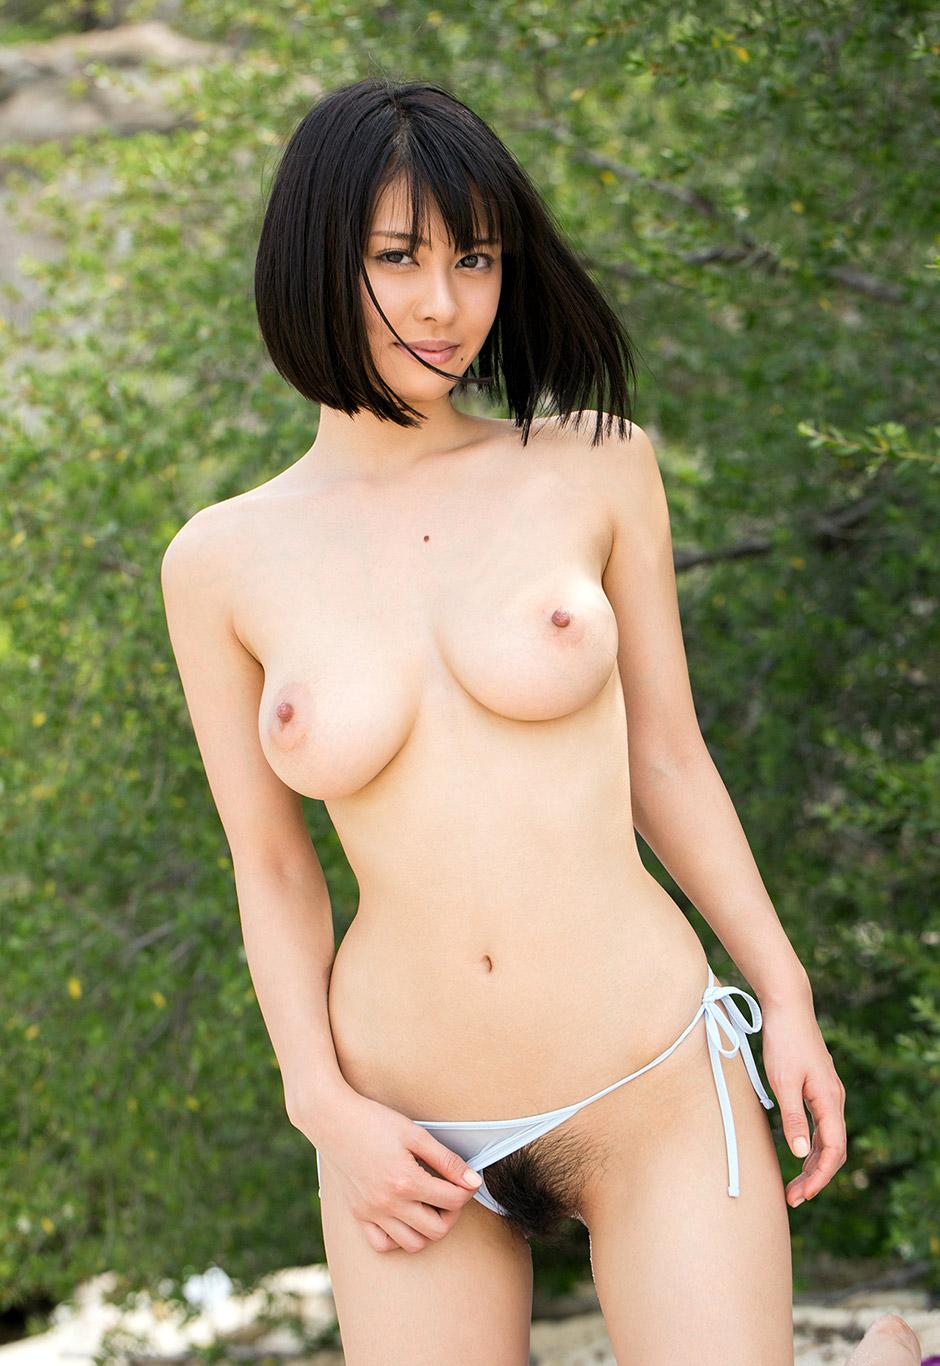 Chaina nude foking, lynne miller pornstar